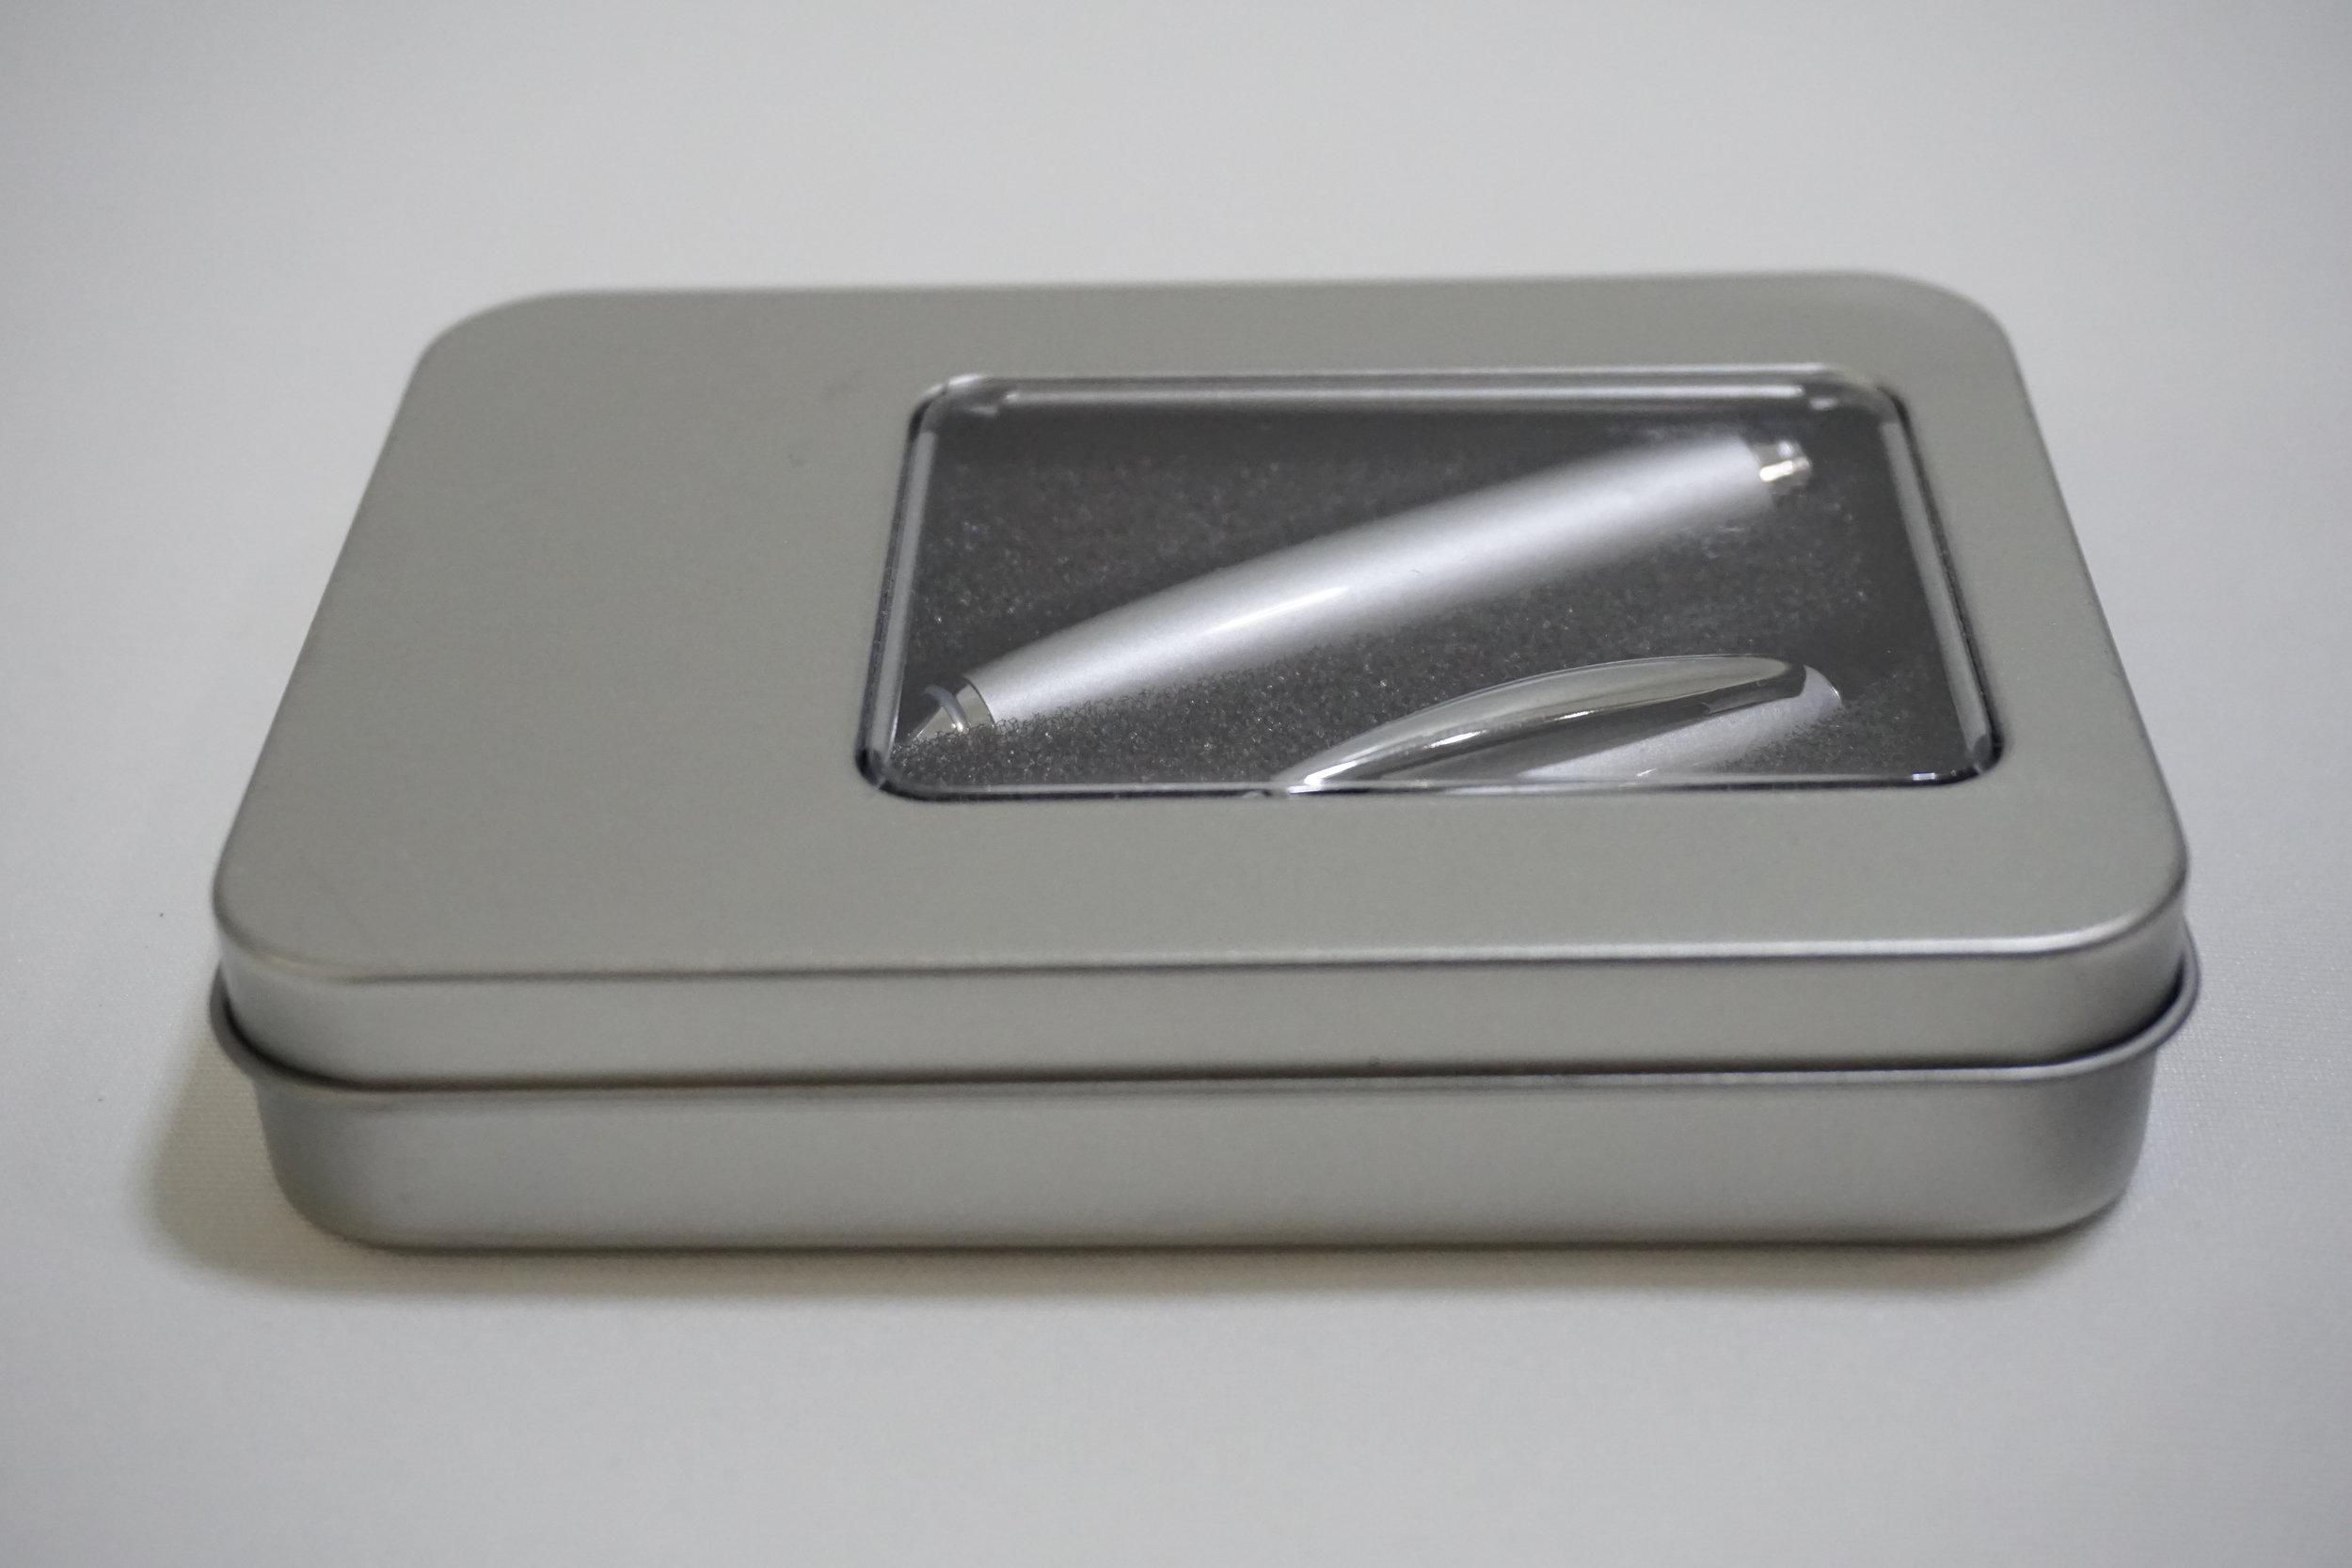 USB Pen (2).JPG